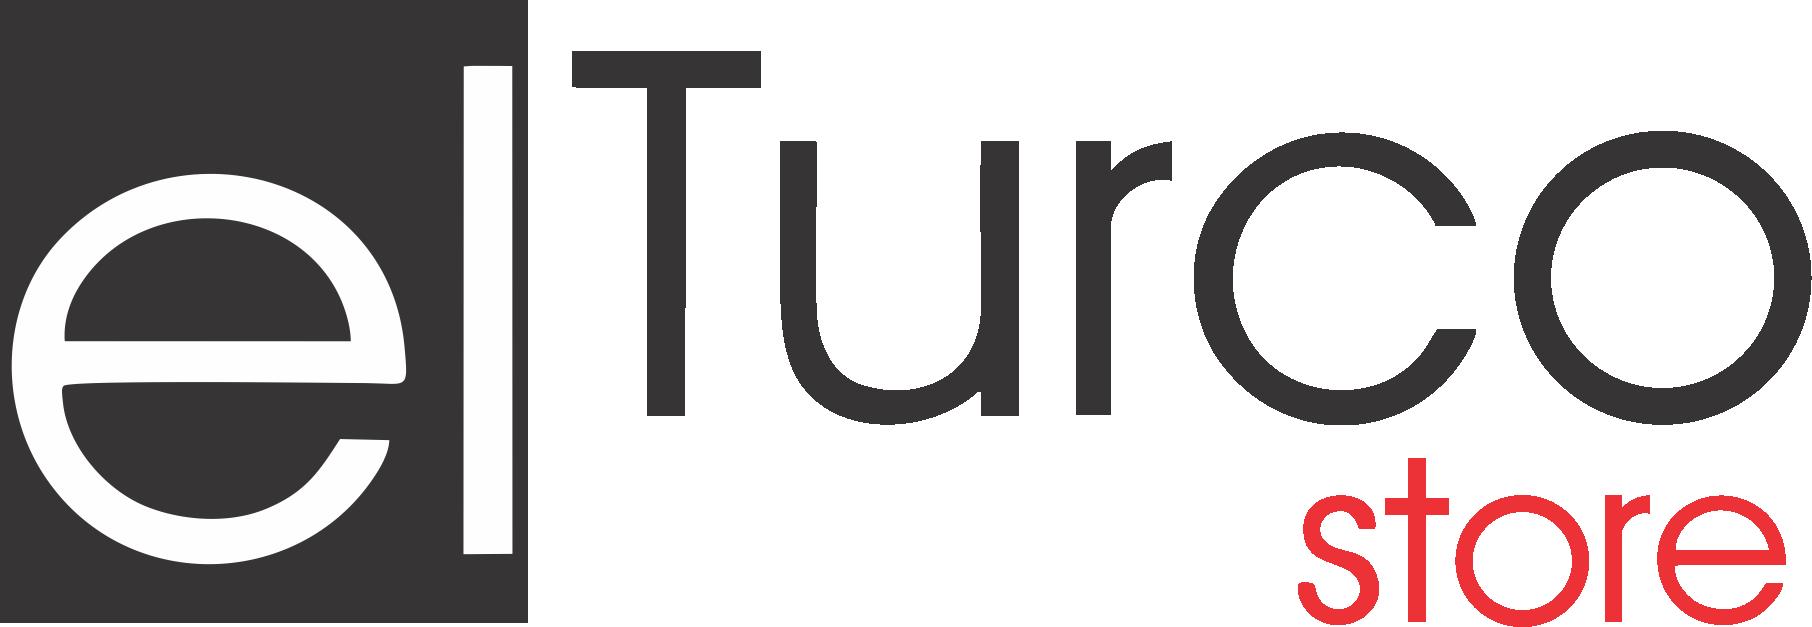 el turco store logo